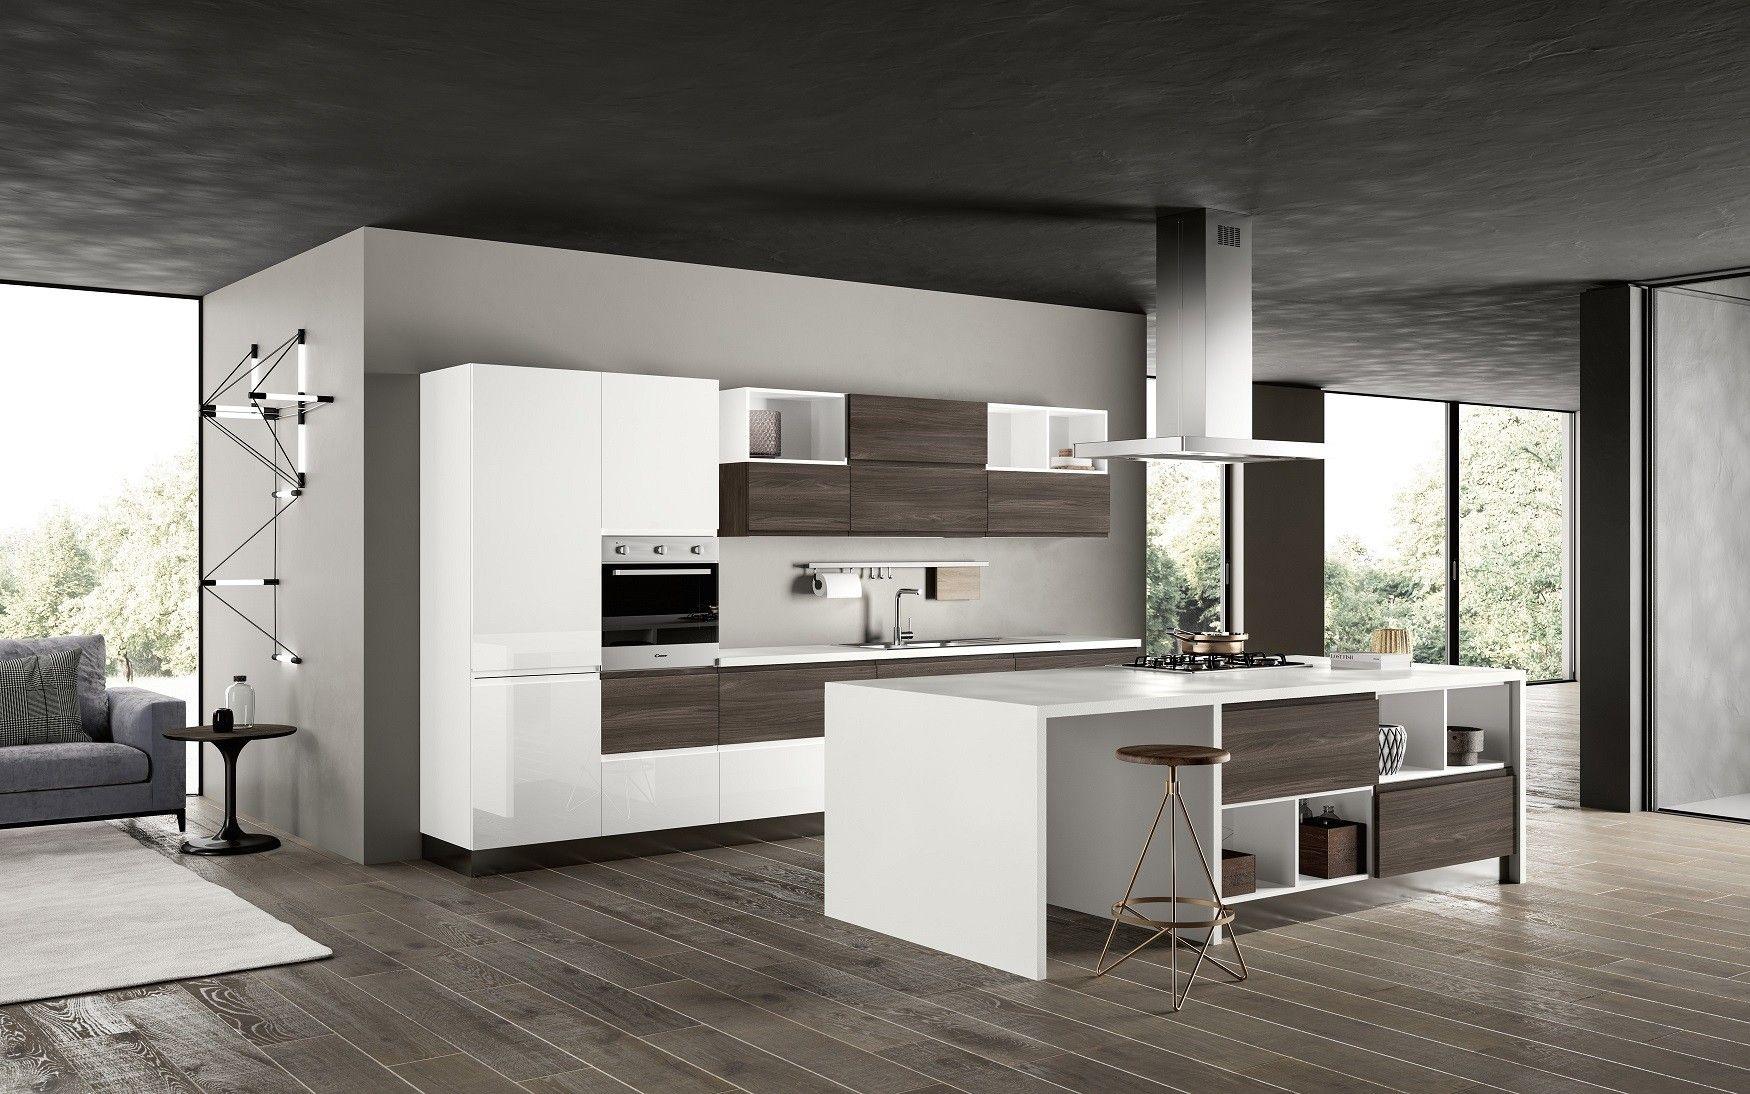 Cucina moderna nuova